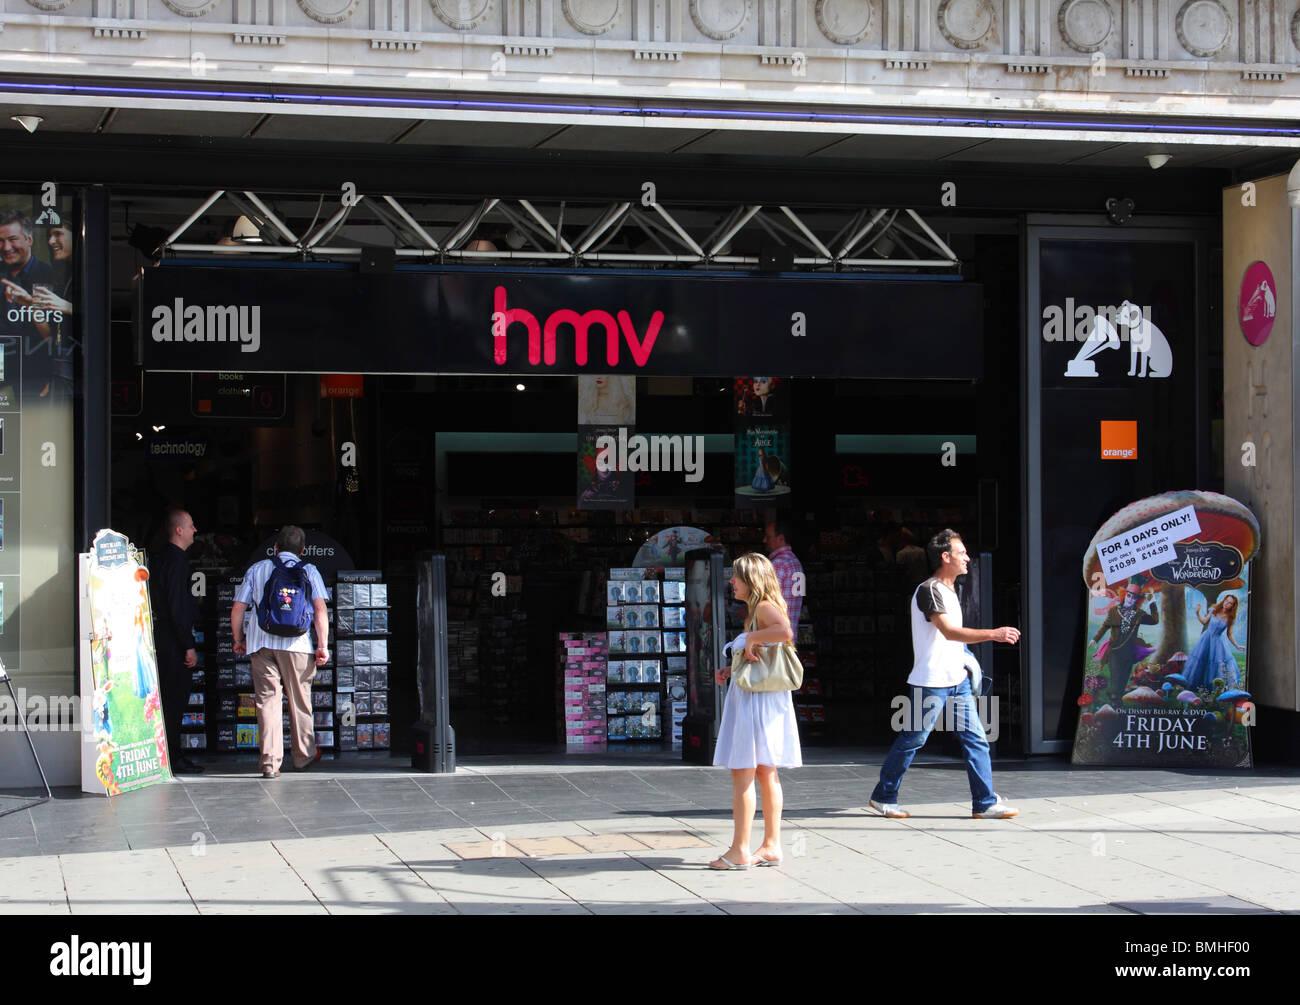 An HMV store on Oxford Street, London, England, U.K. - Stock Image